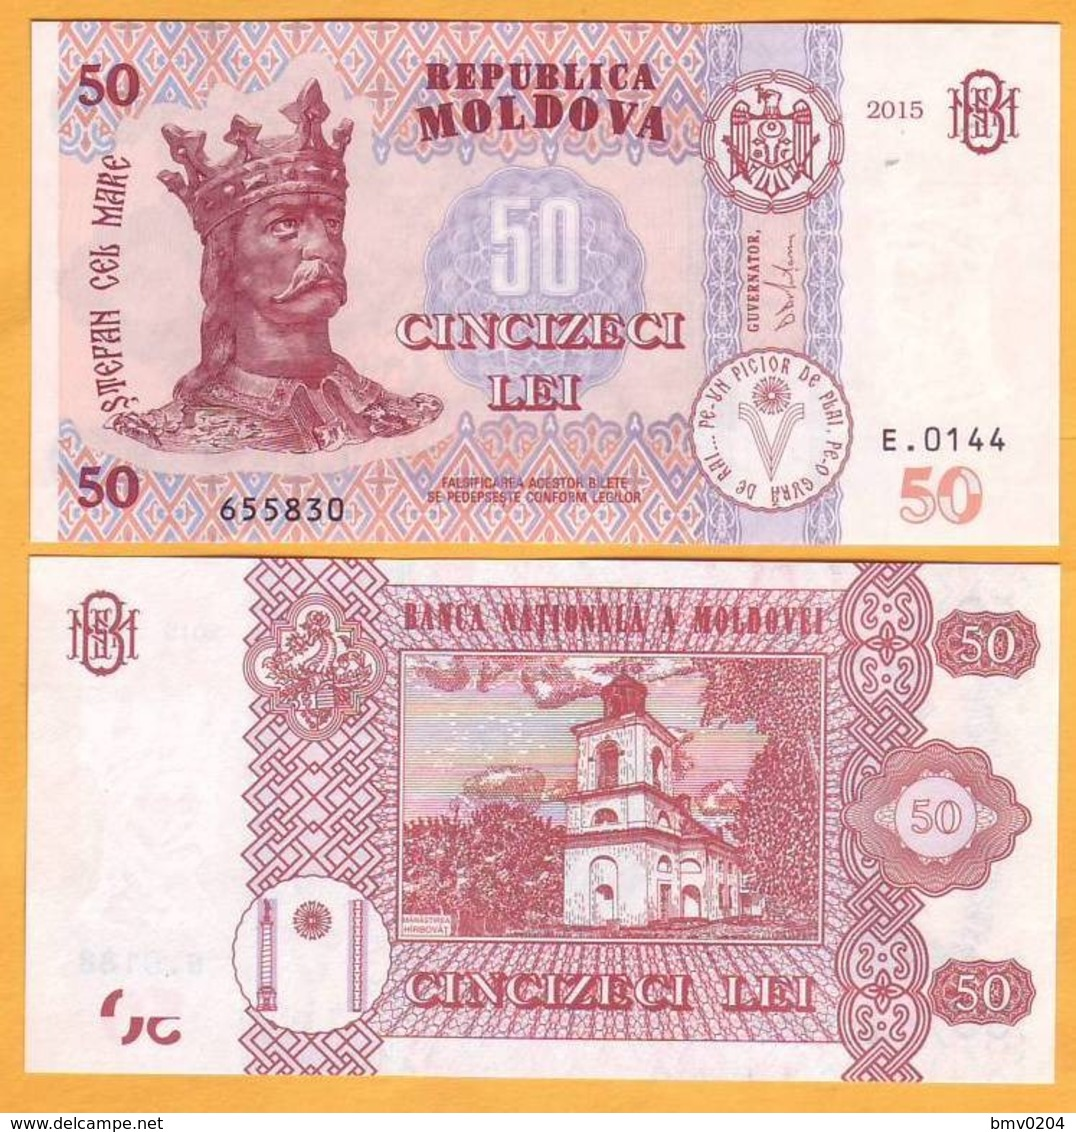 2017 2015 Moldova ; Moldavie ; Moldau    50 LEI   655830 UNC - Moldavia